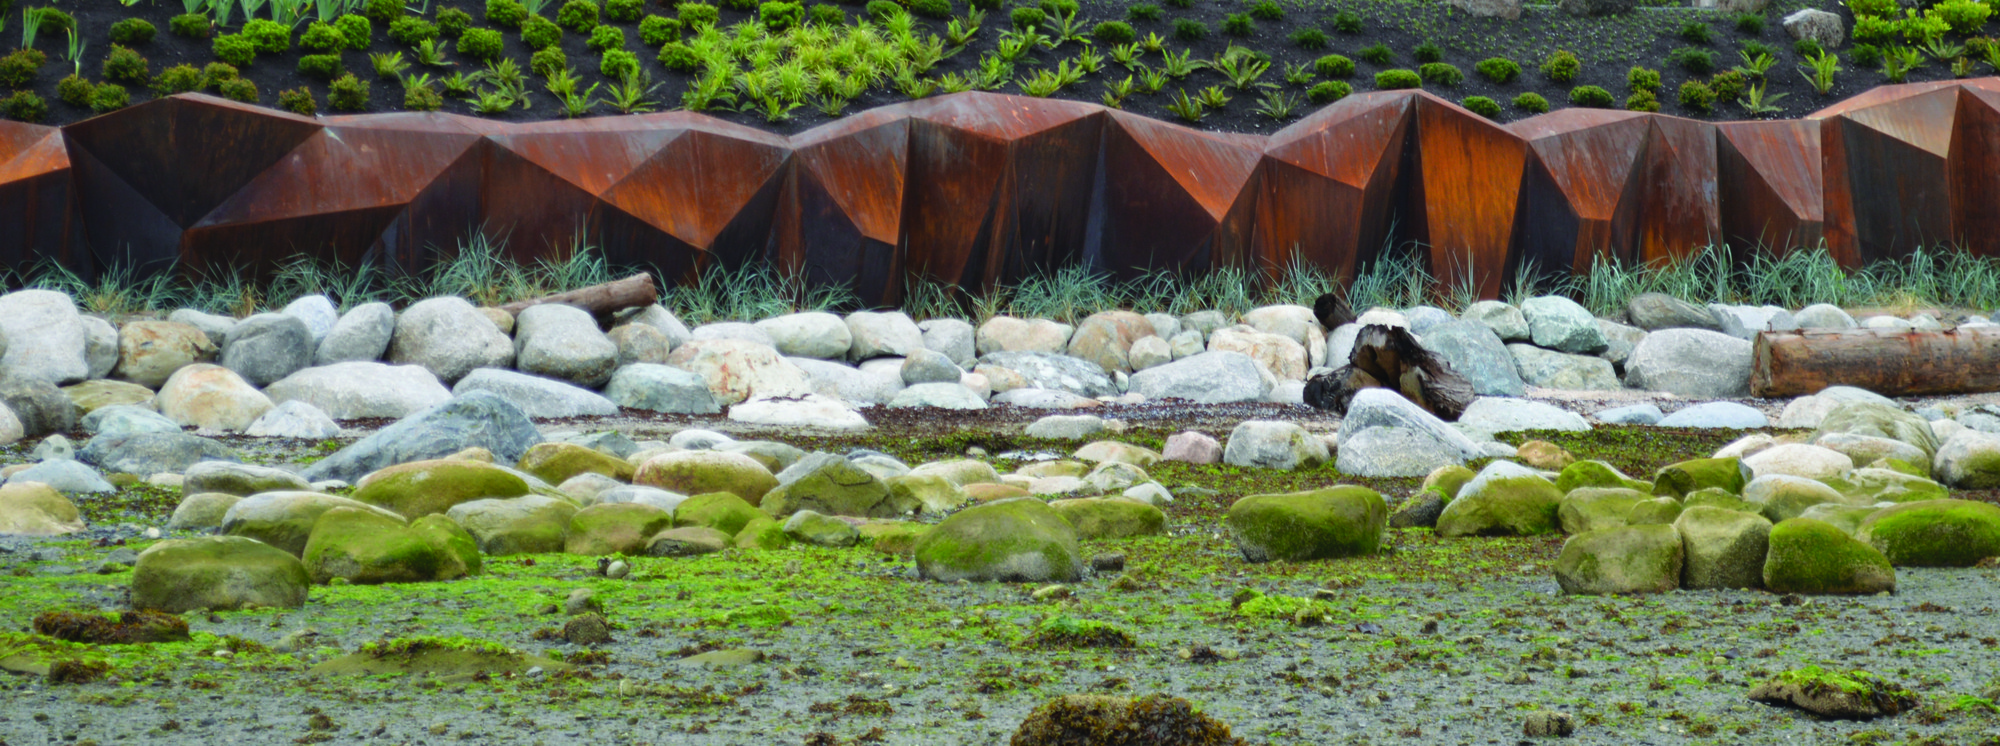 Cortesia de Paul Sangha Landscape Architecture